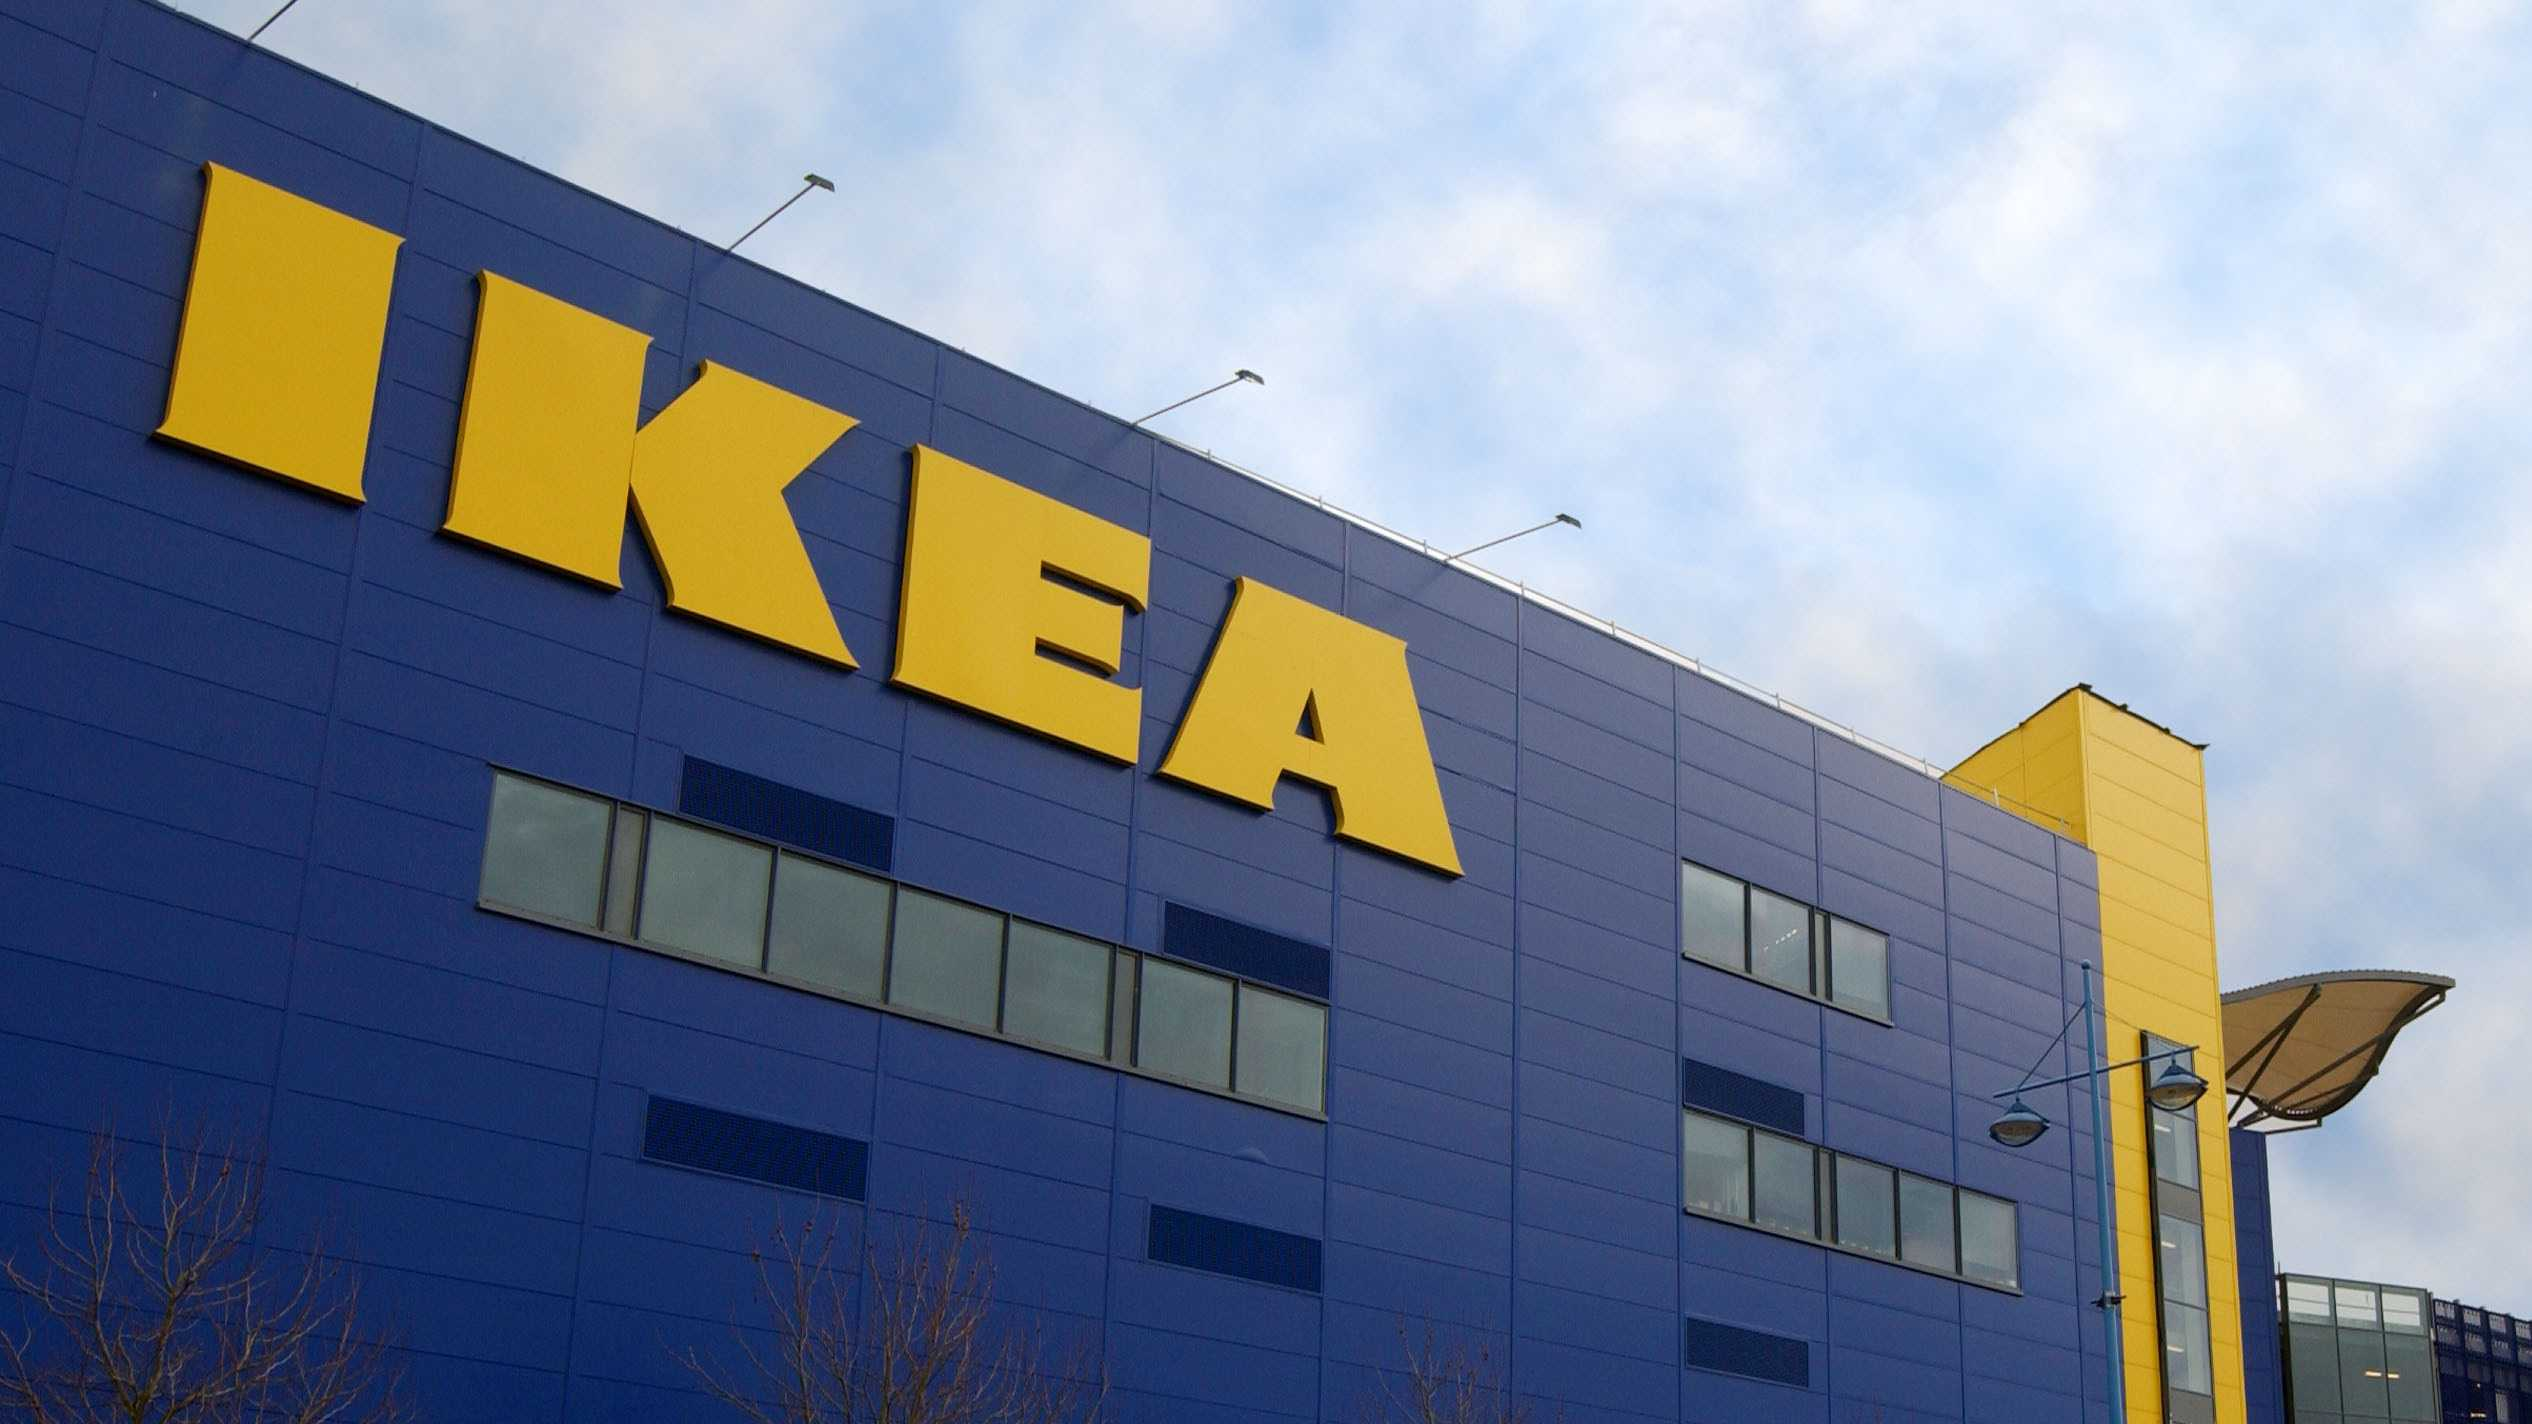 Ikea Generic Store.jpg